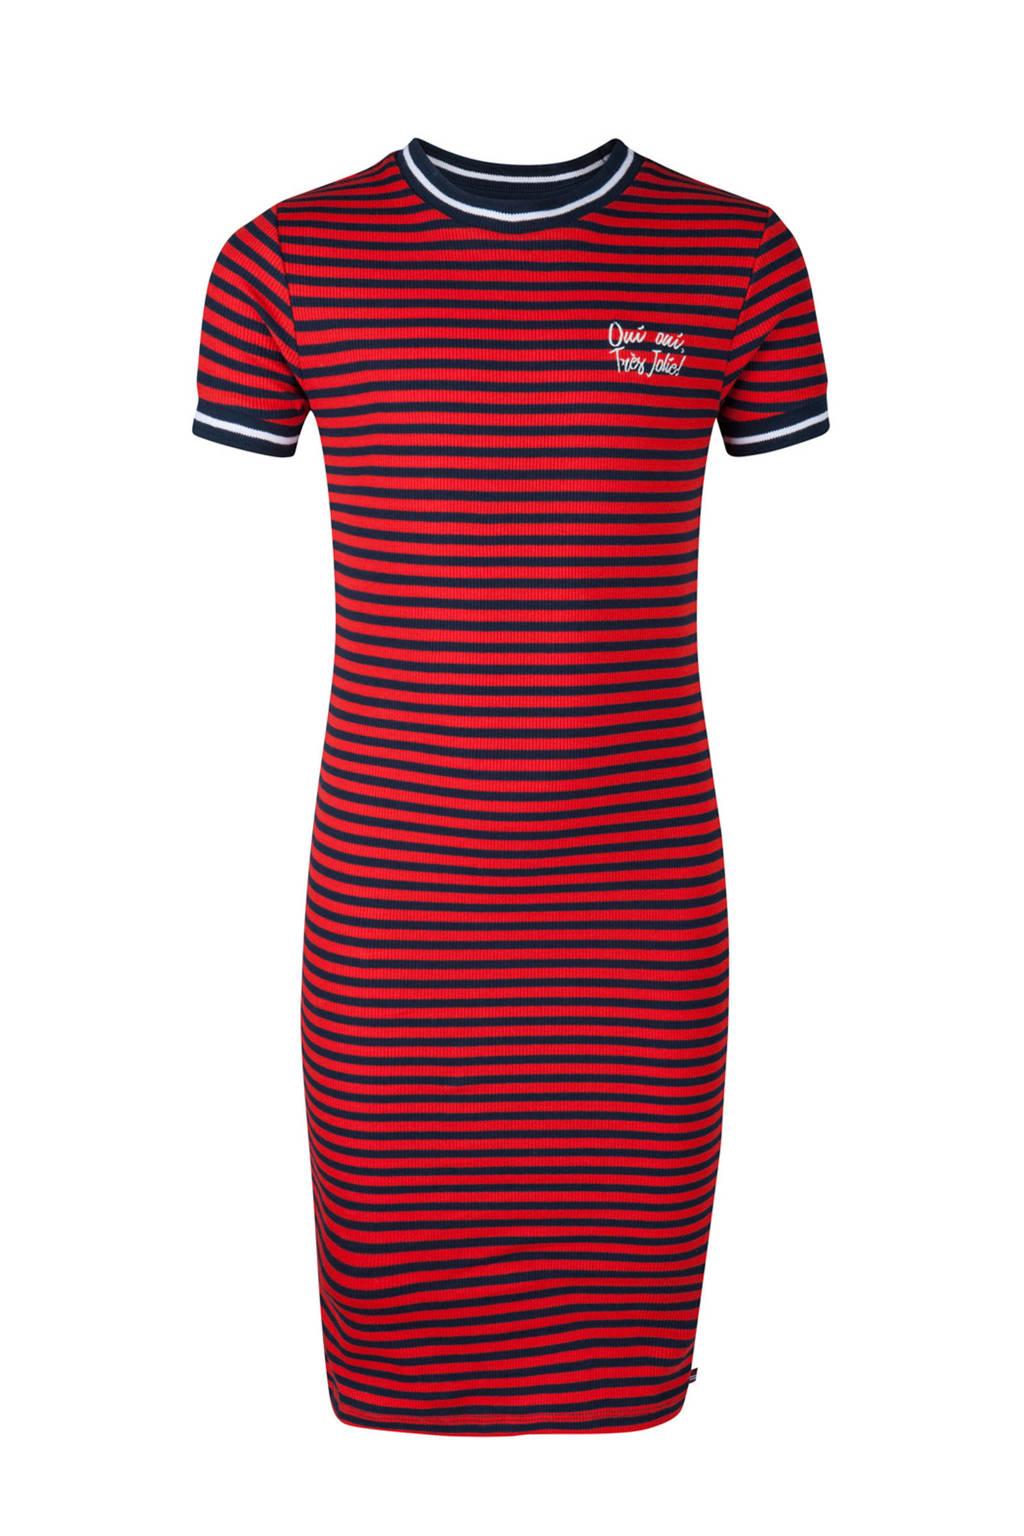 WE Fashion gestreepte jurk rood/blauw, Rood/blauw